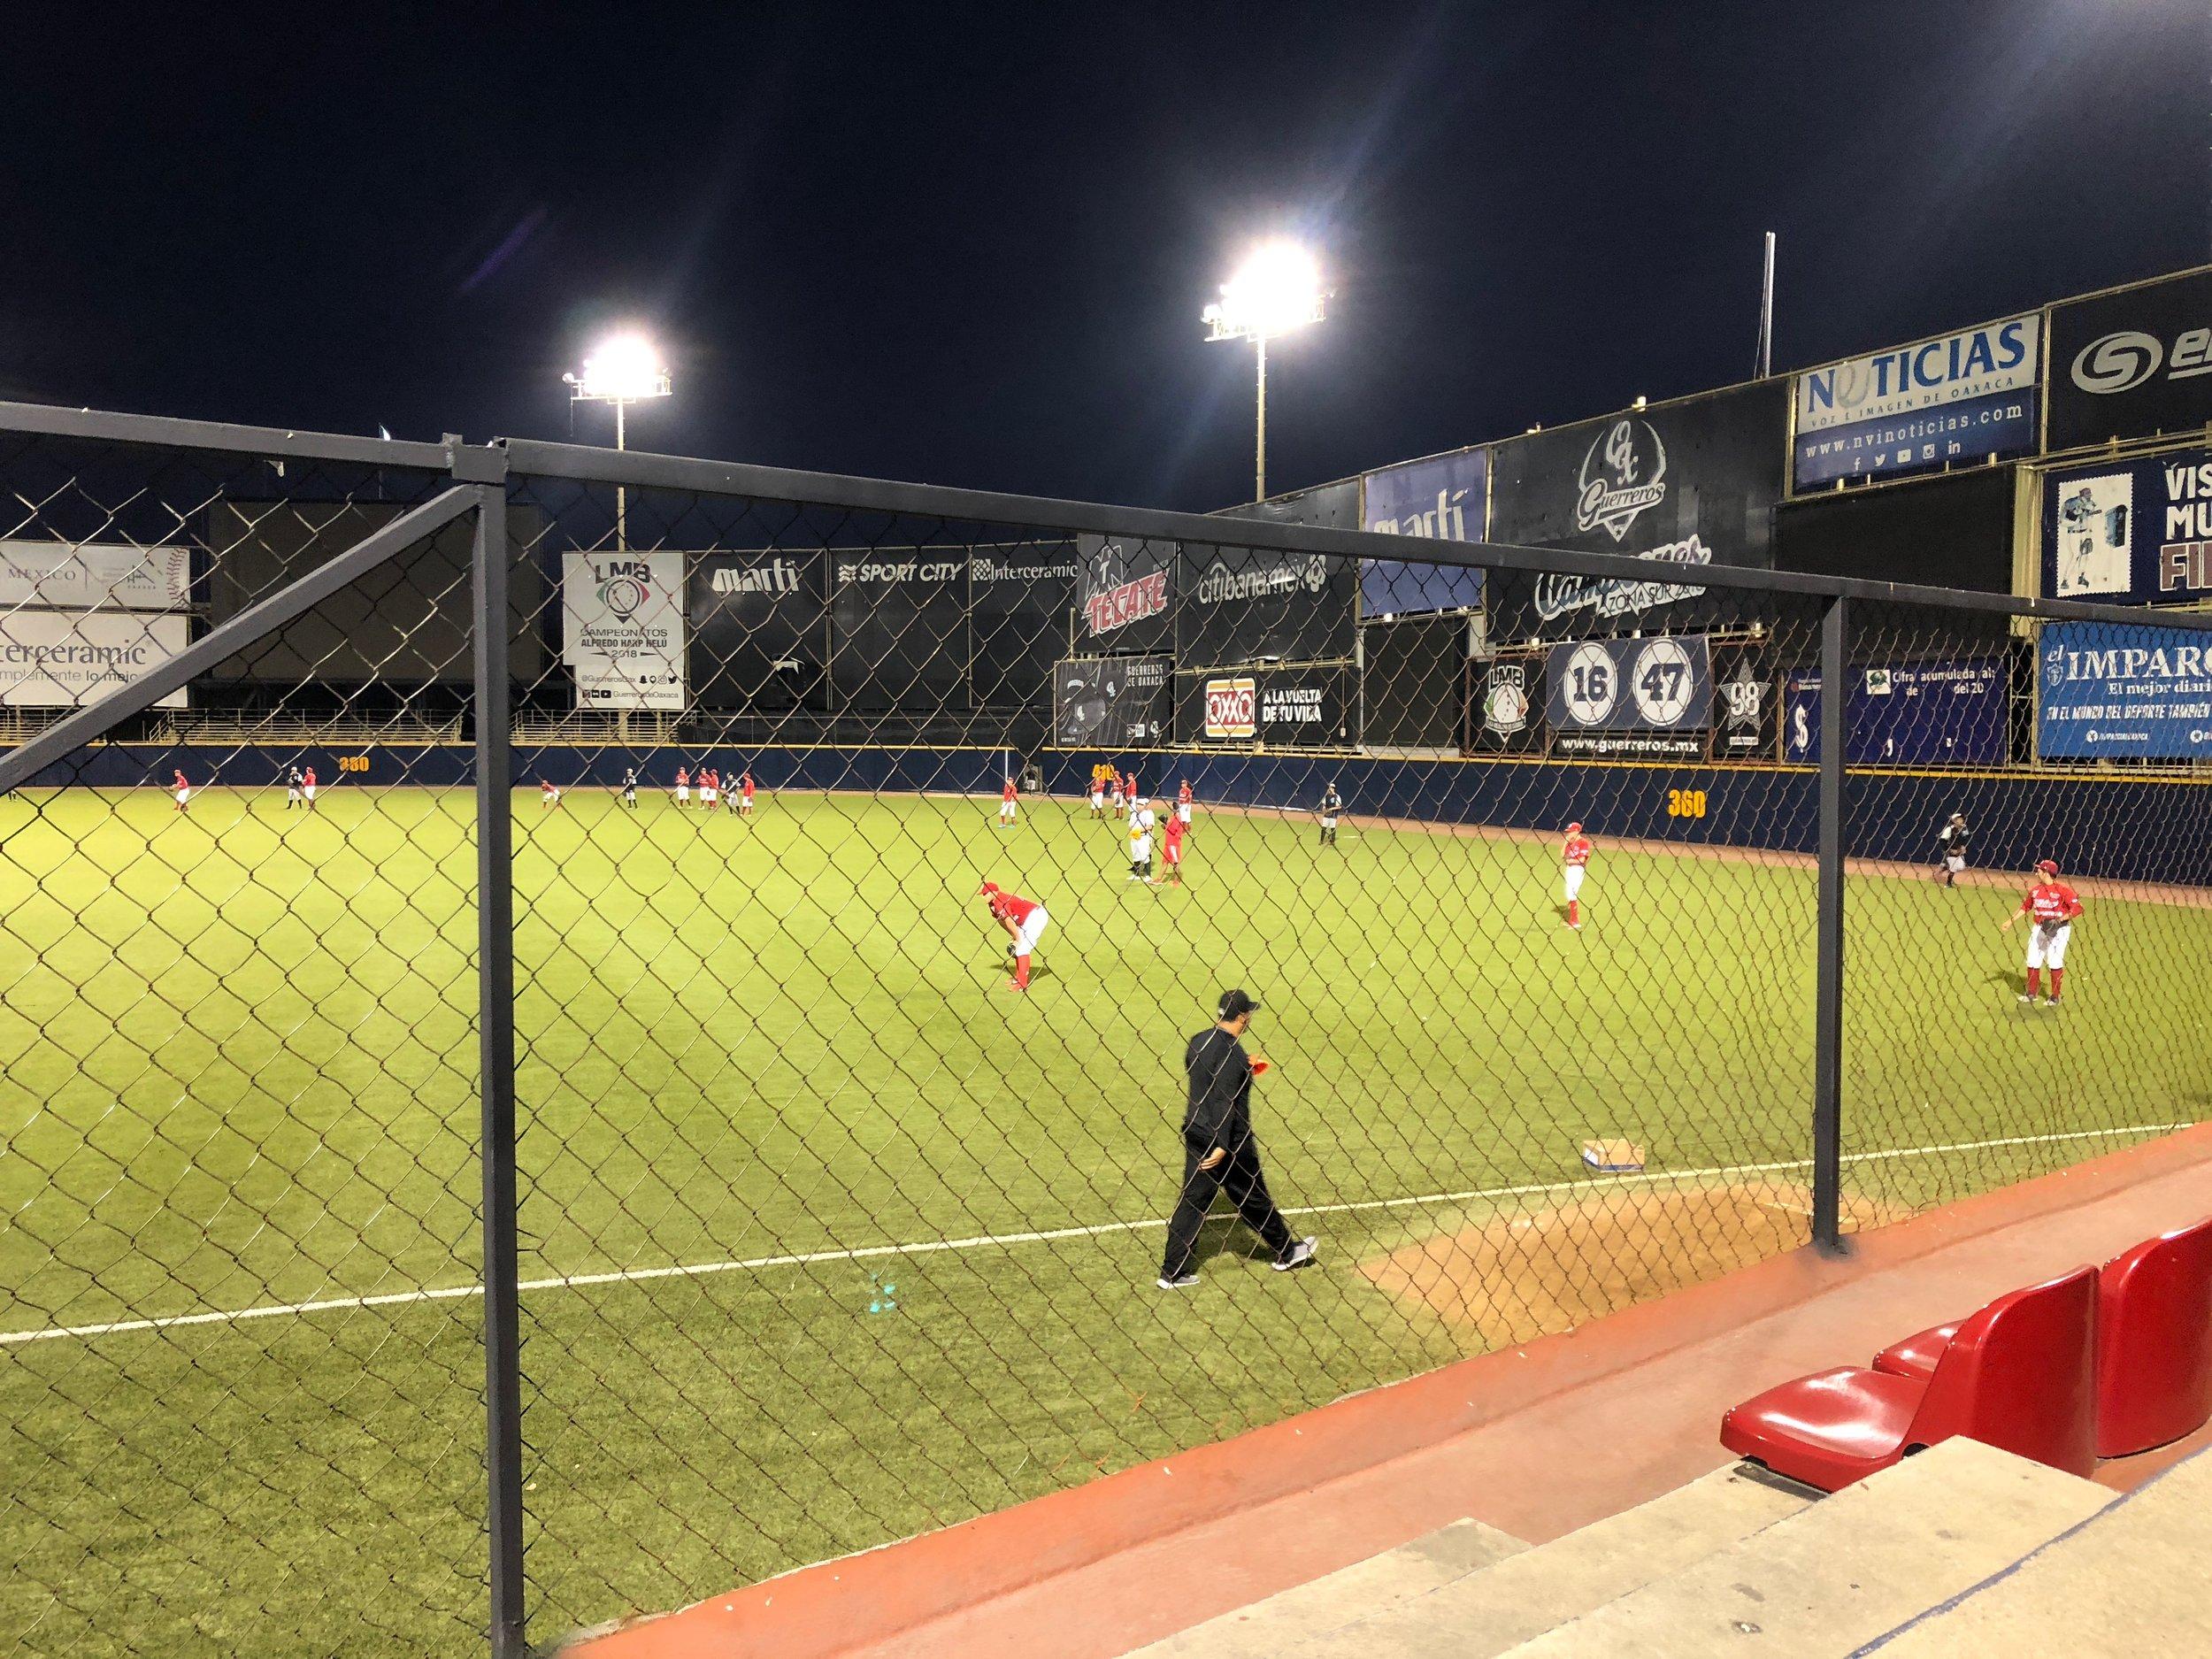 Oaxaca has a professional baseball team that is very popular